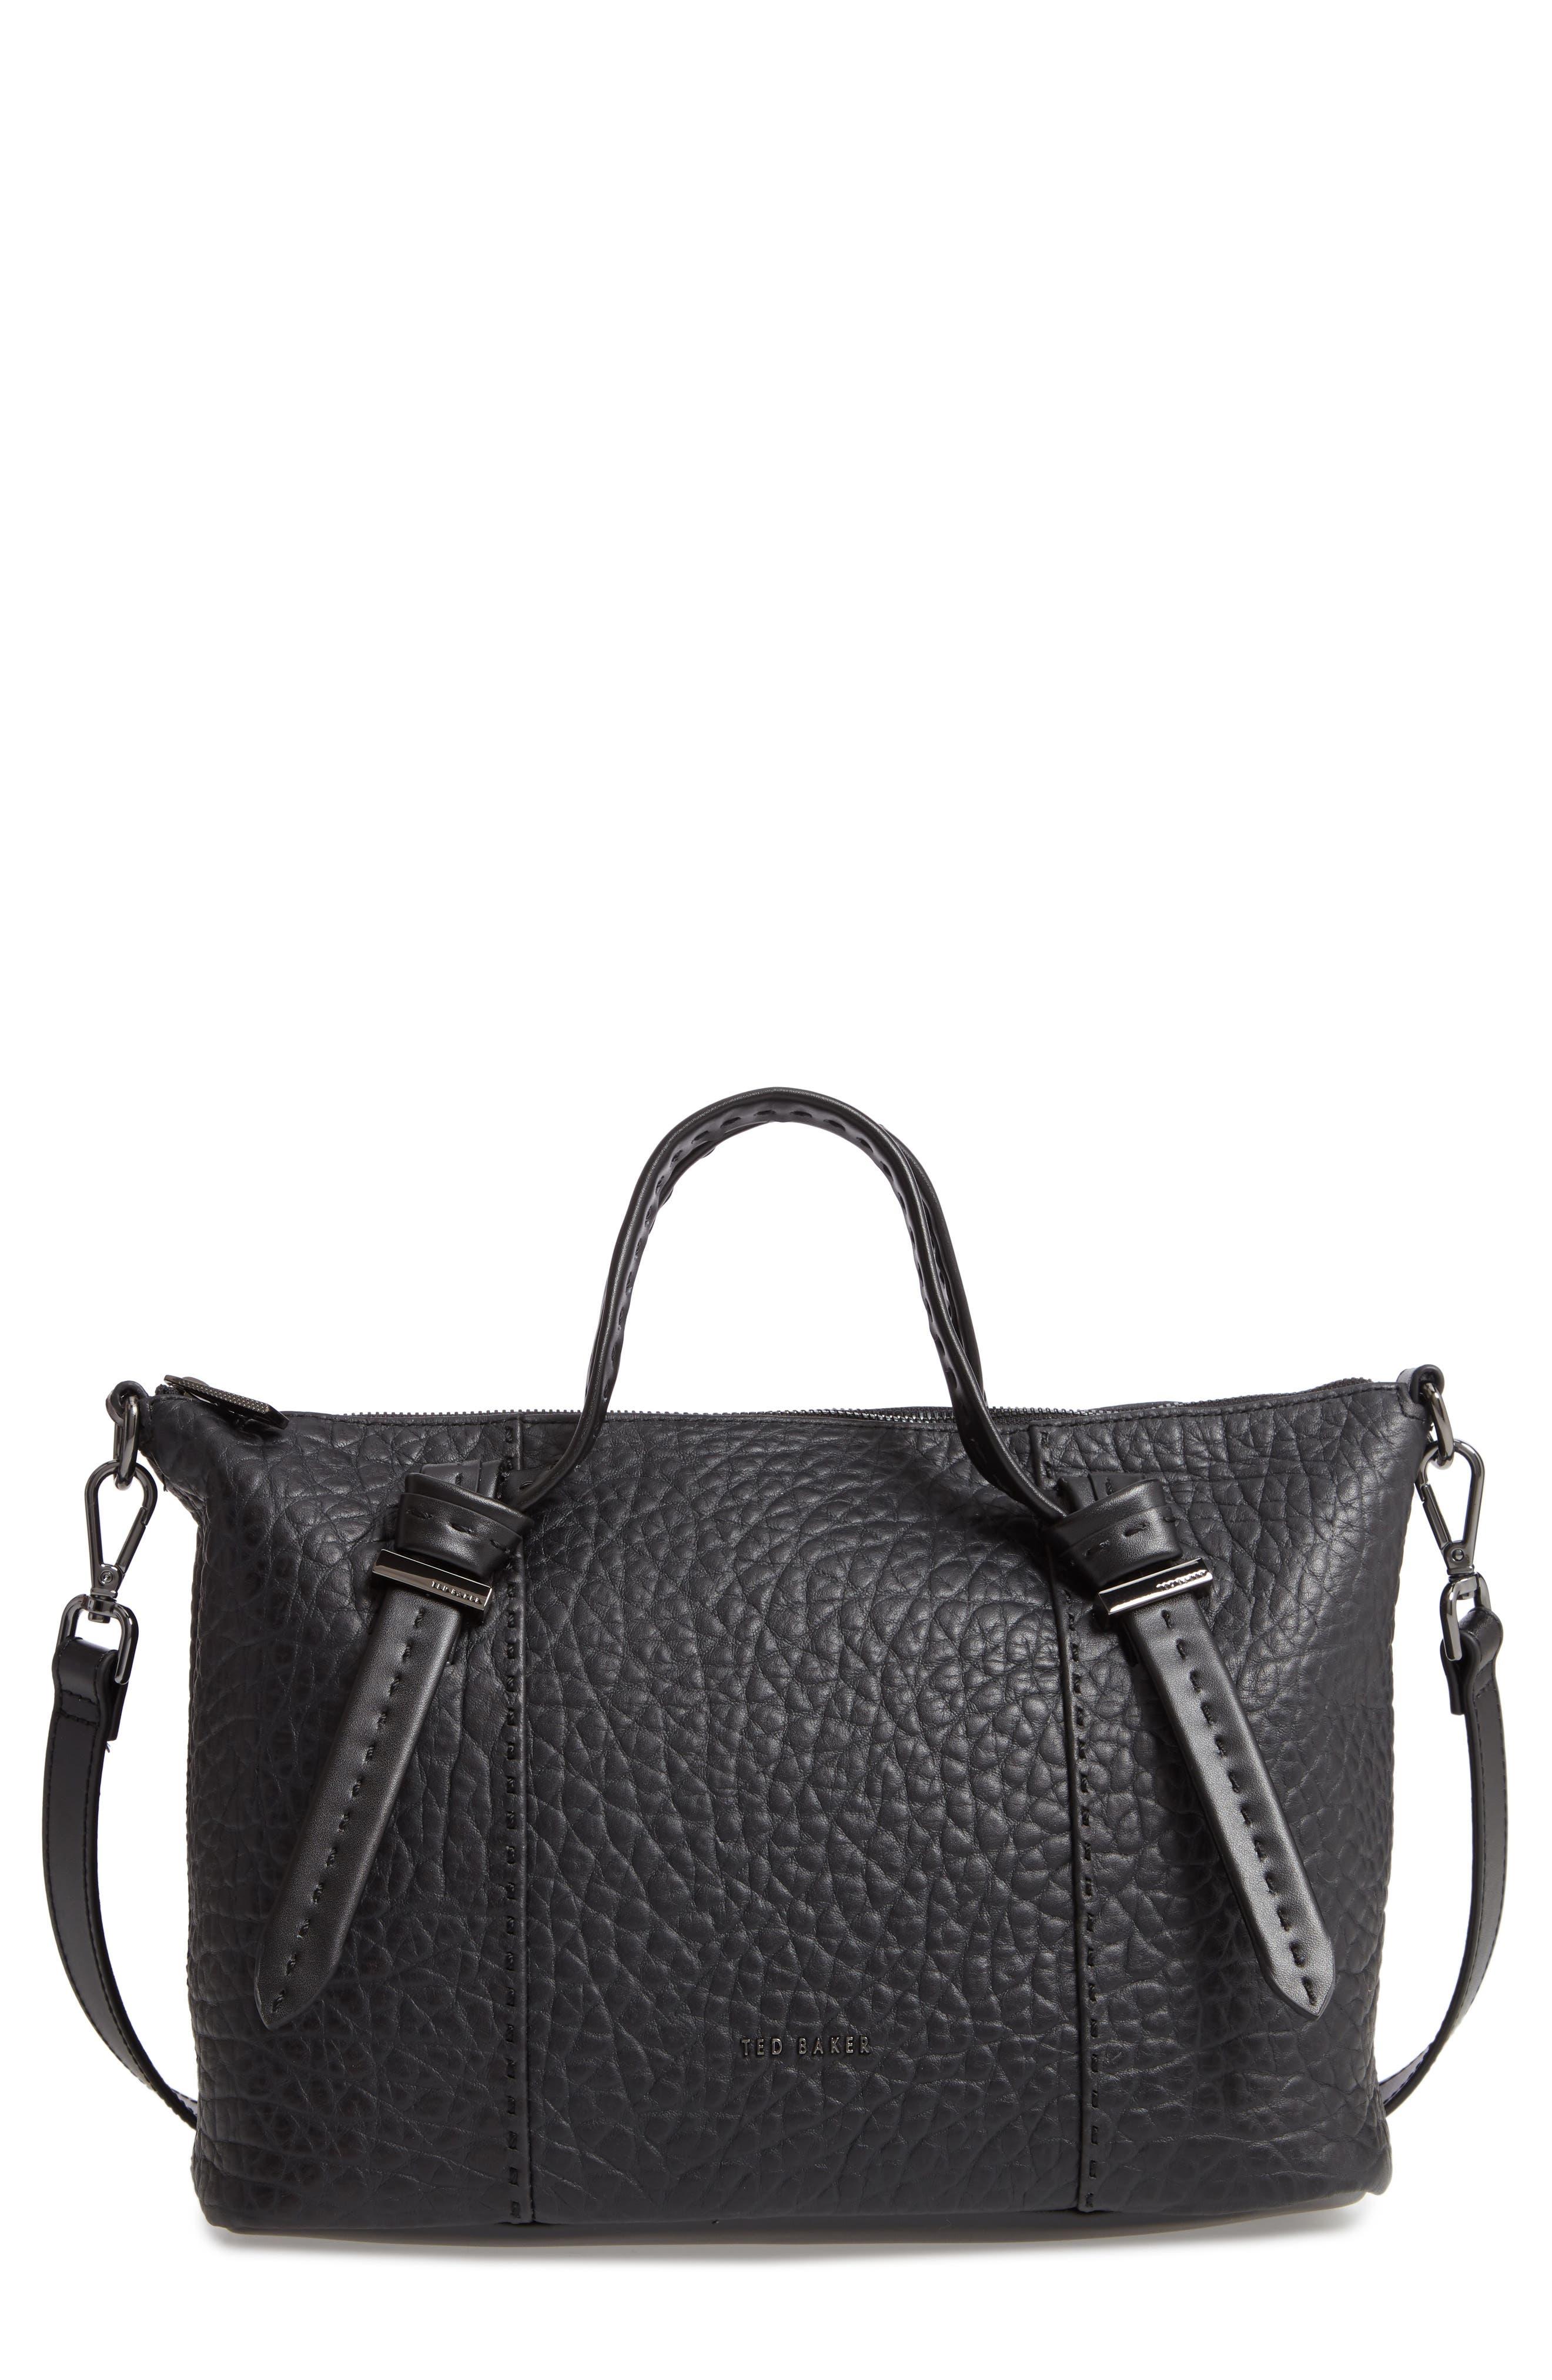 Olmia Small Leather Tote, Main, color, JET BLACK